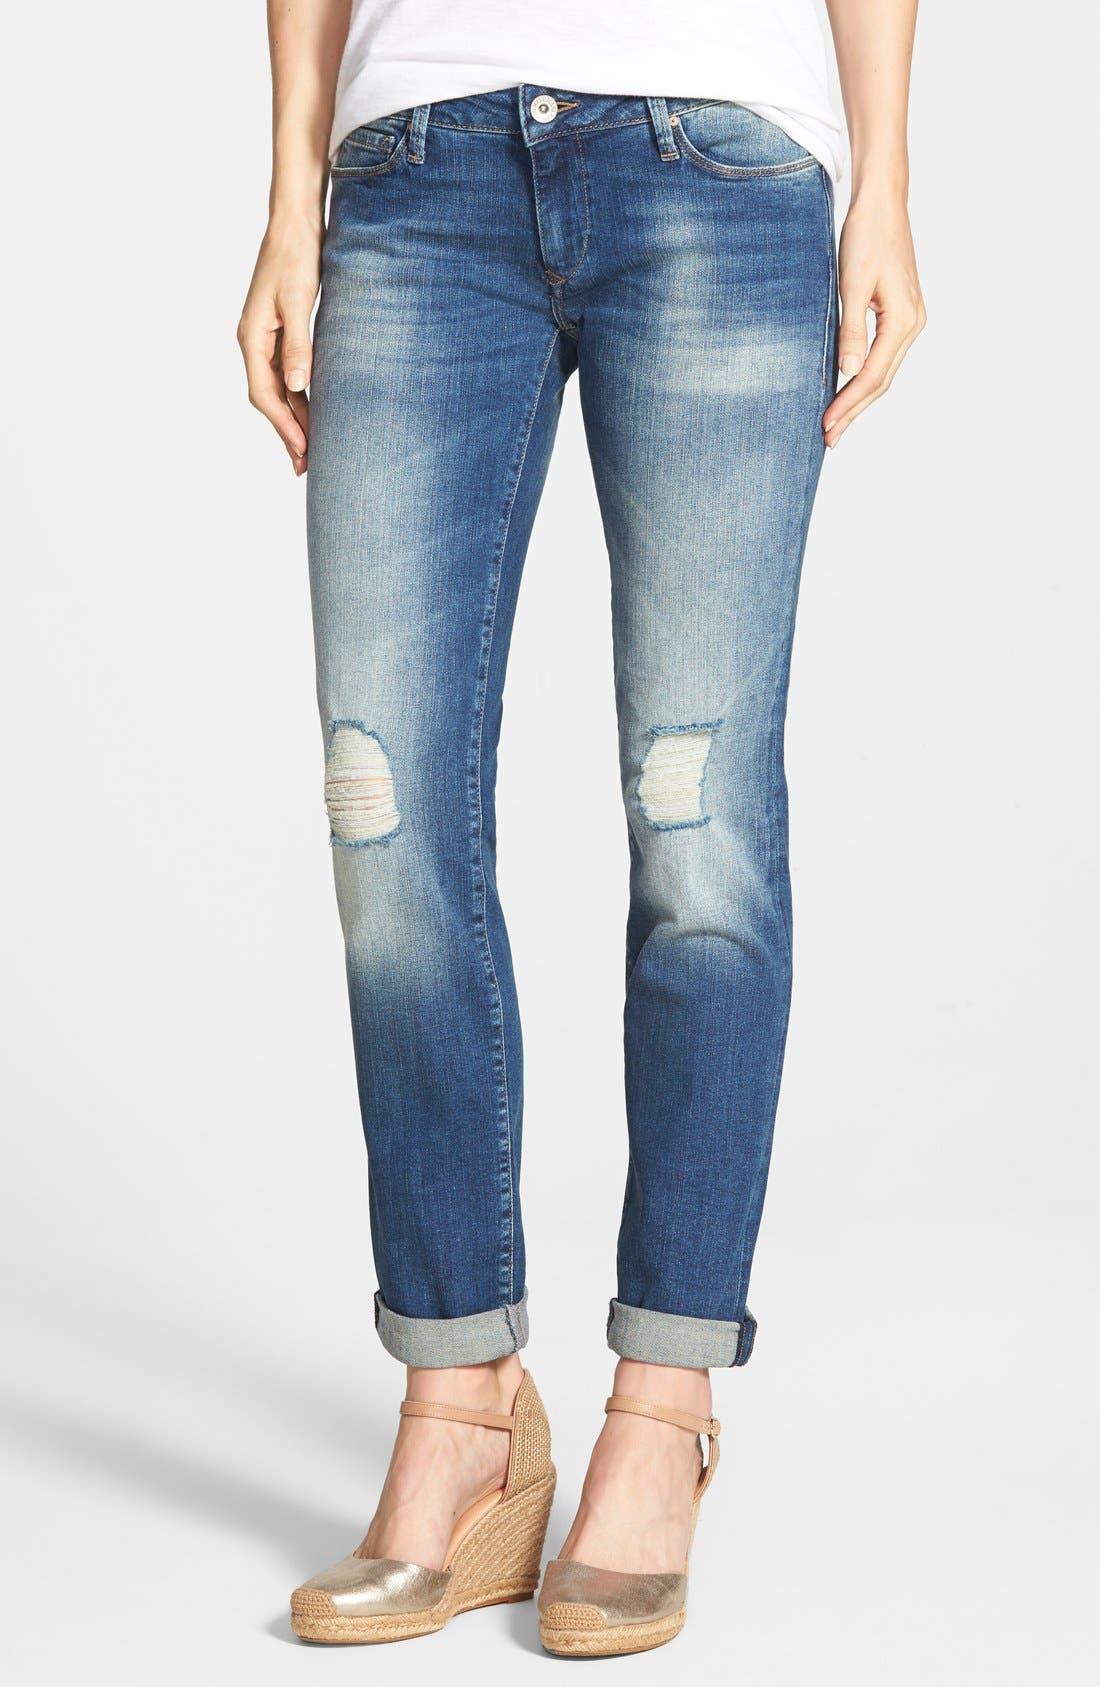 Alternate Image 1 Selected - Mavi Jeans Emma Ripped Knee Boyfriend Slim Jeans (Vintage)